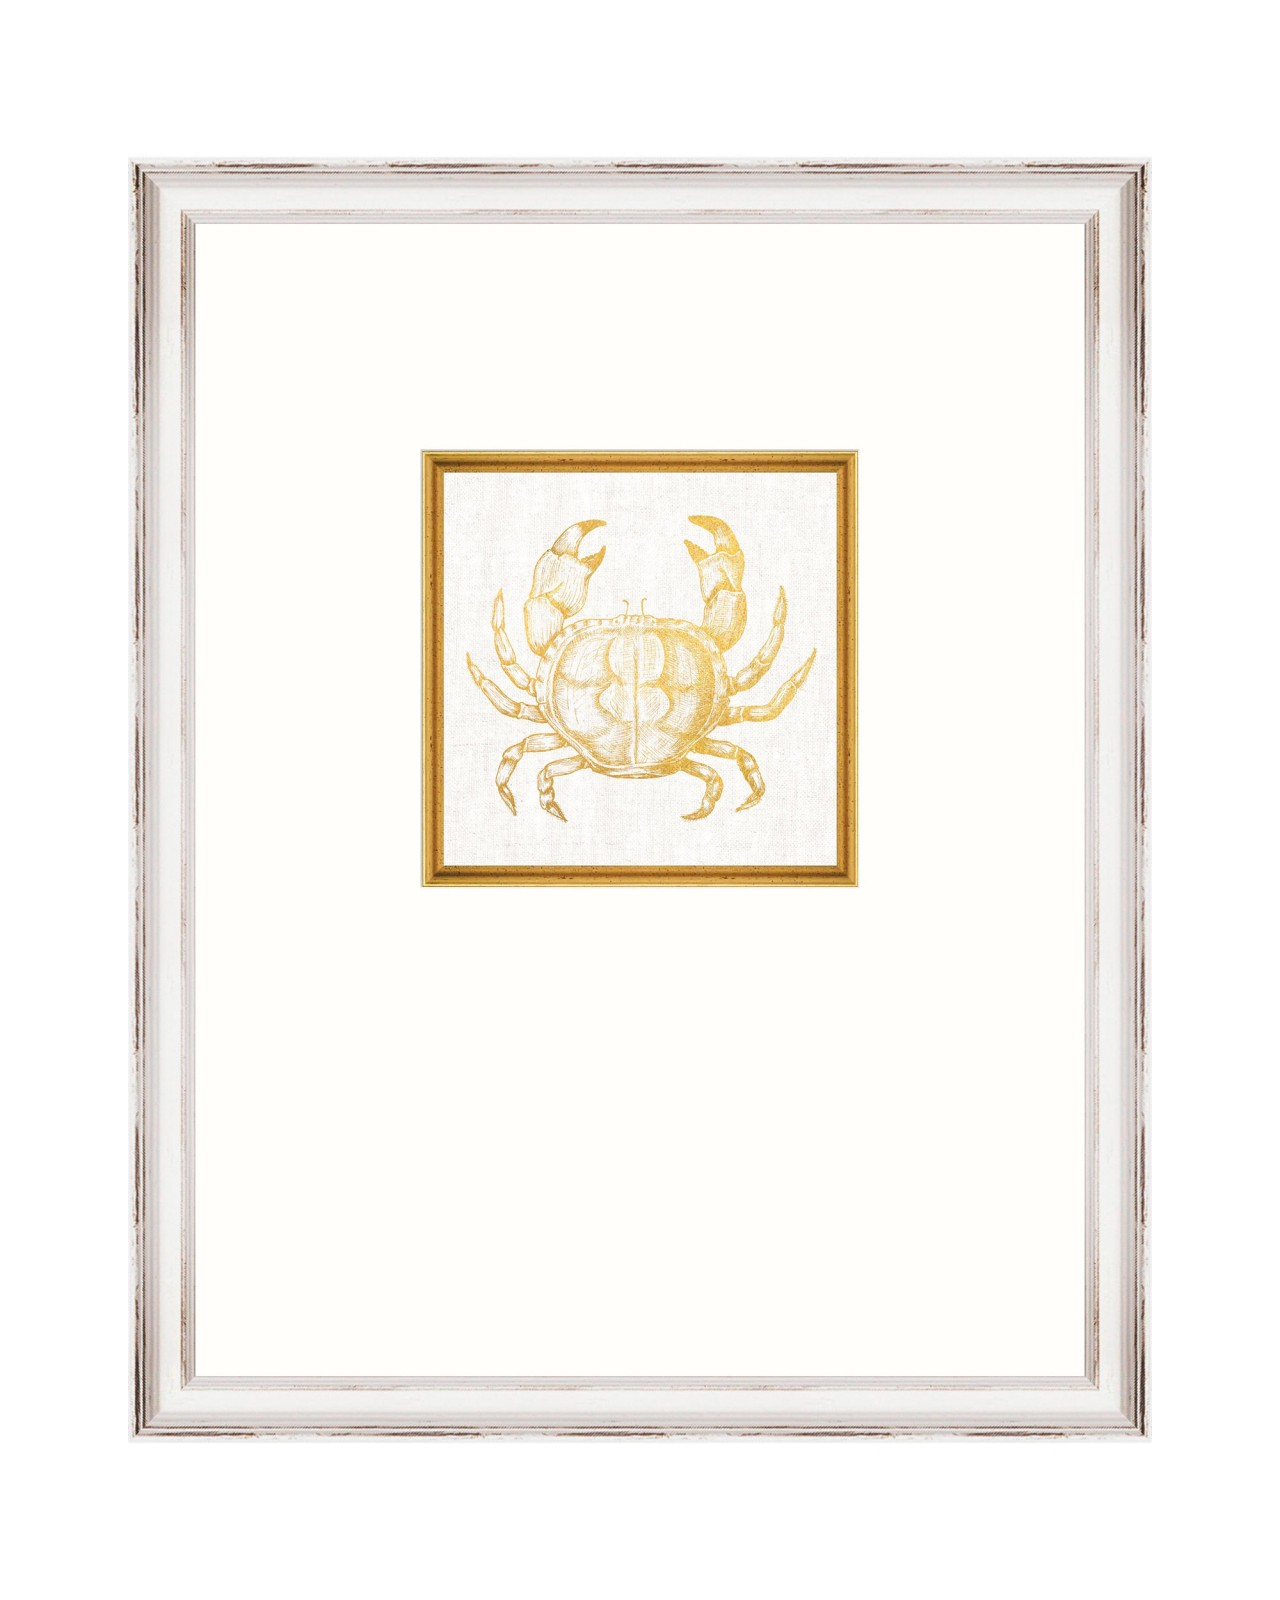 MEDITERRANEAN GEMS - CRAB Framed Linen